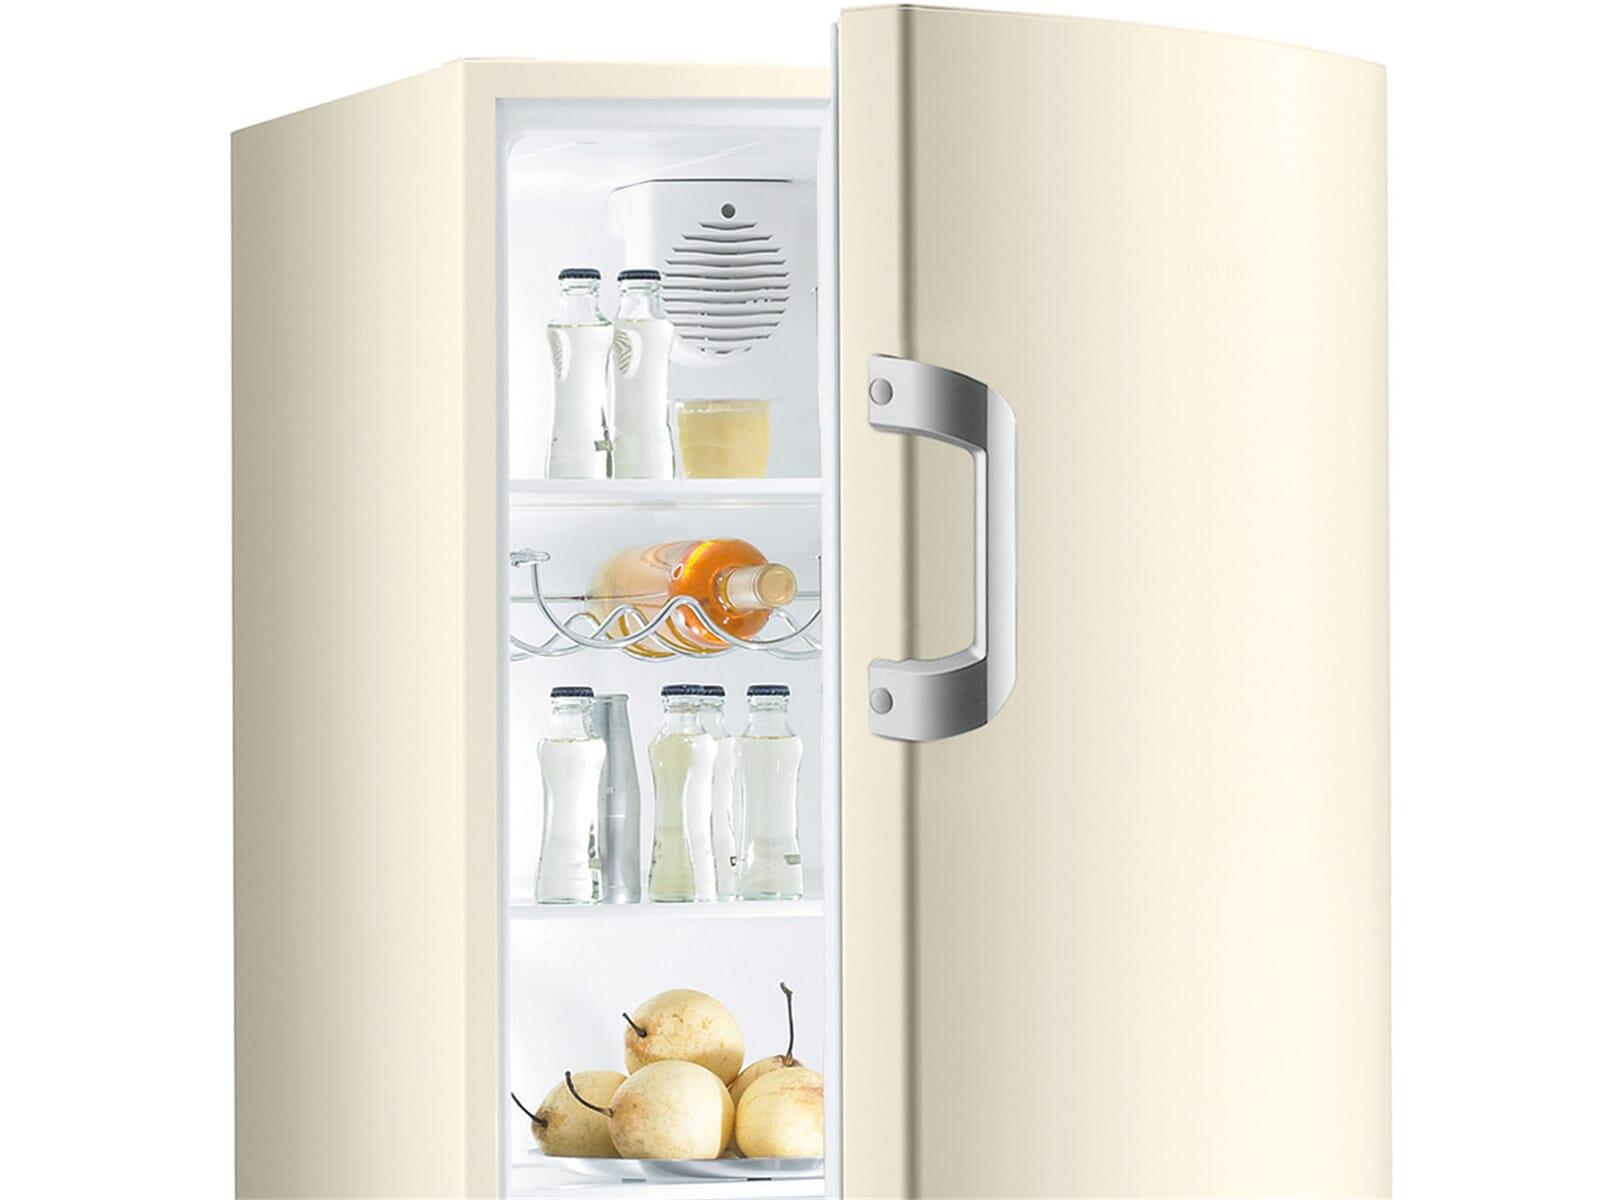 Kühlschrank Creme : Gorenje r bc standkühlschrank creme